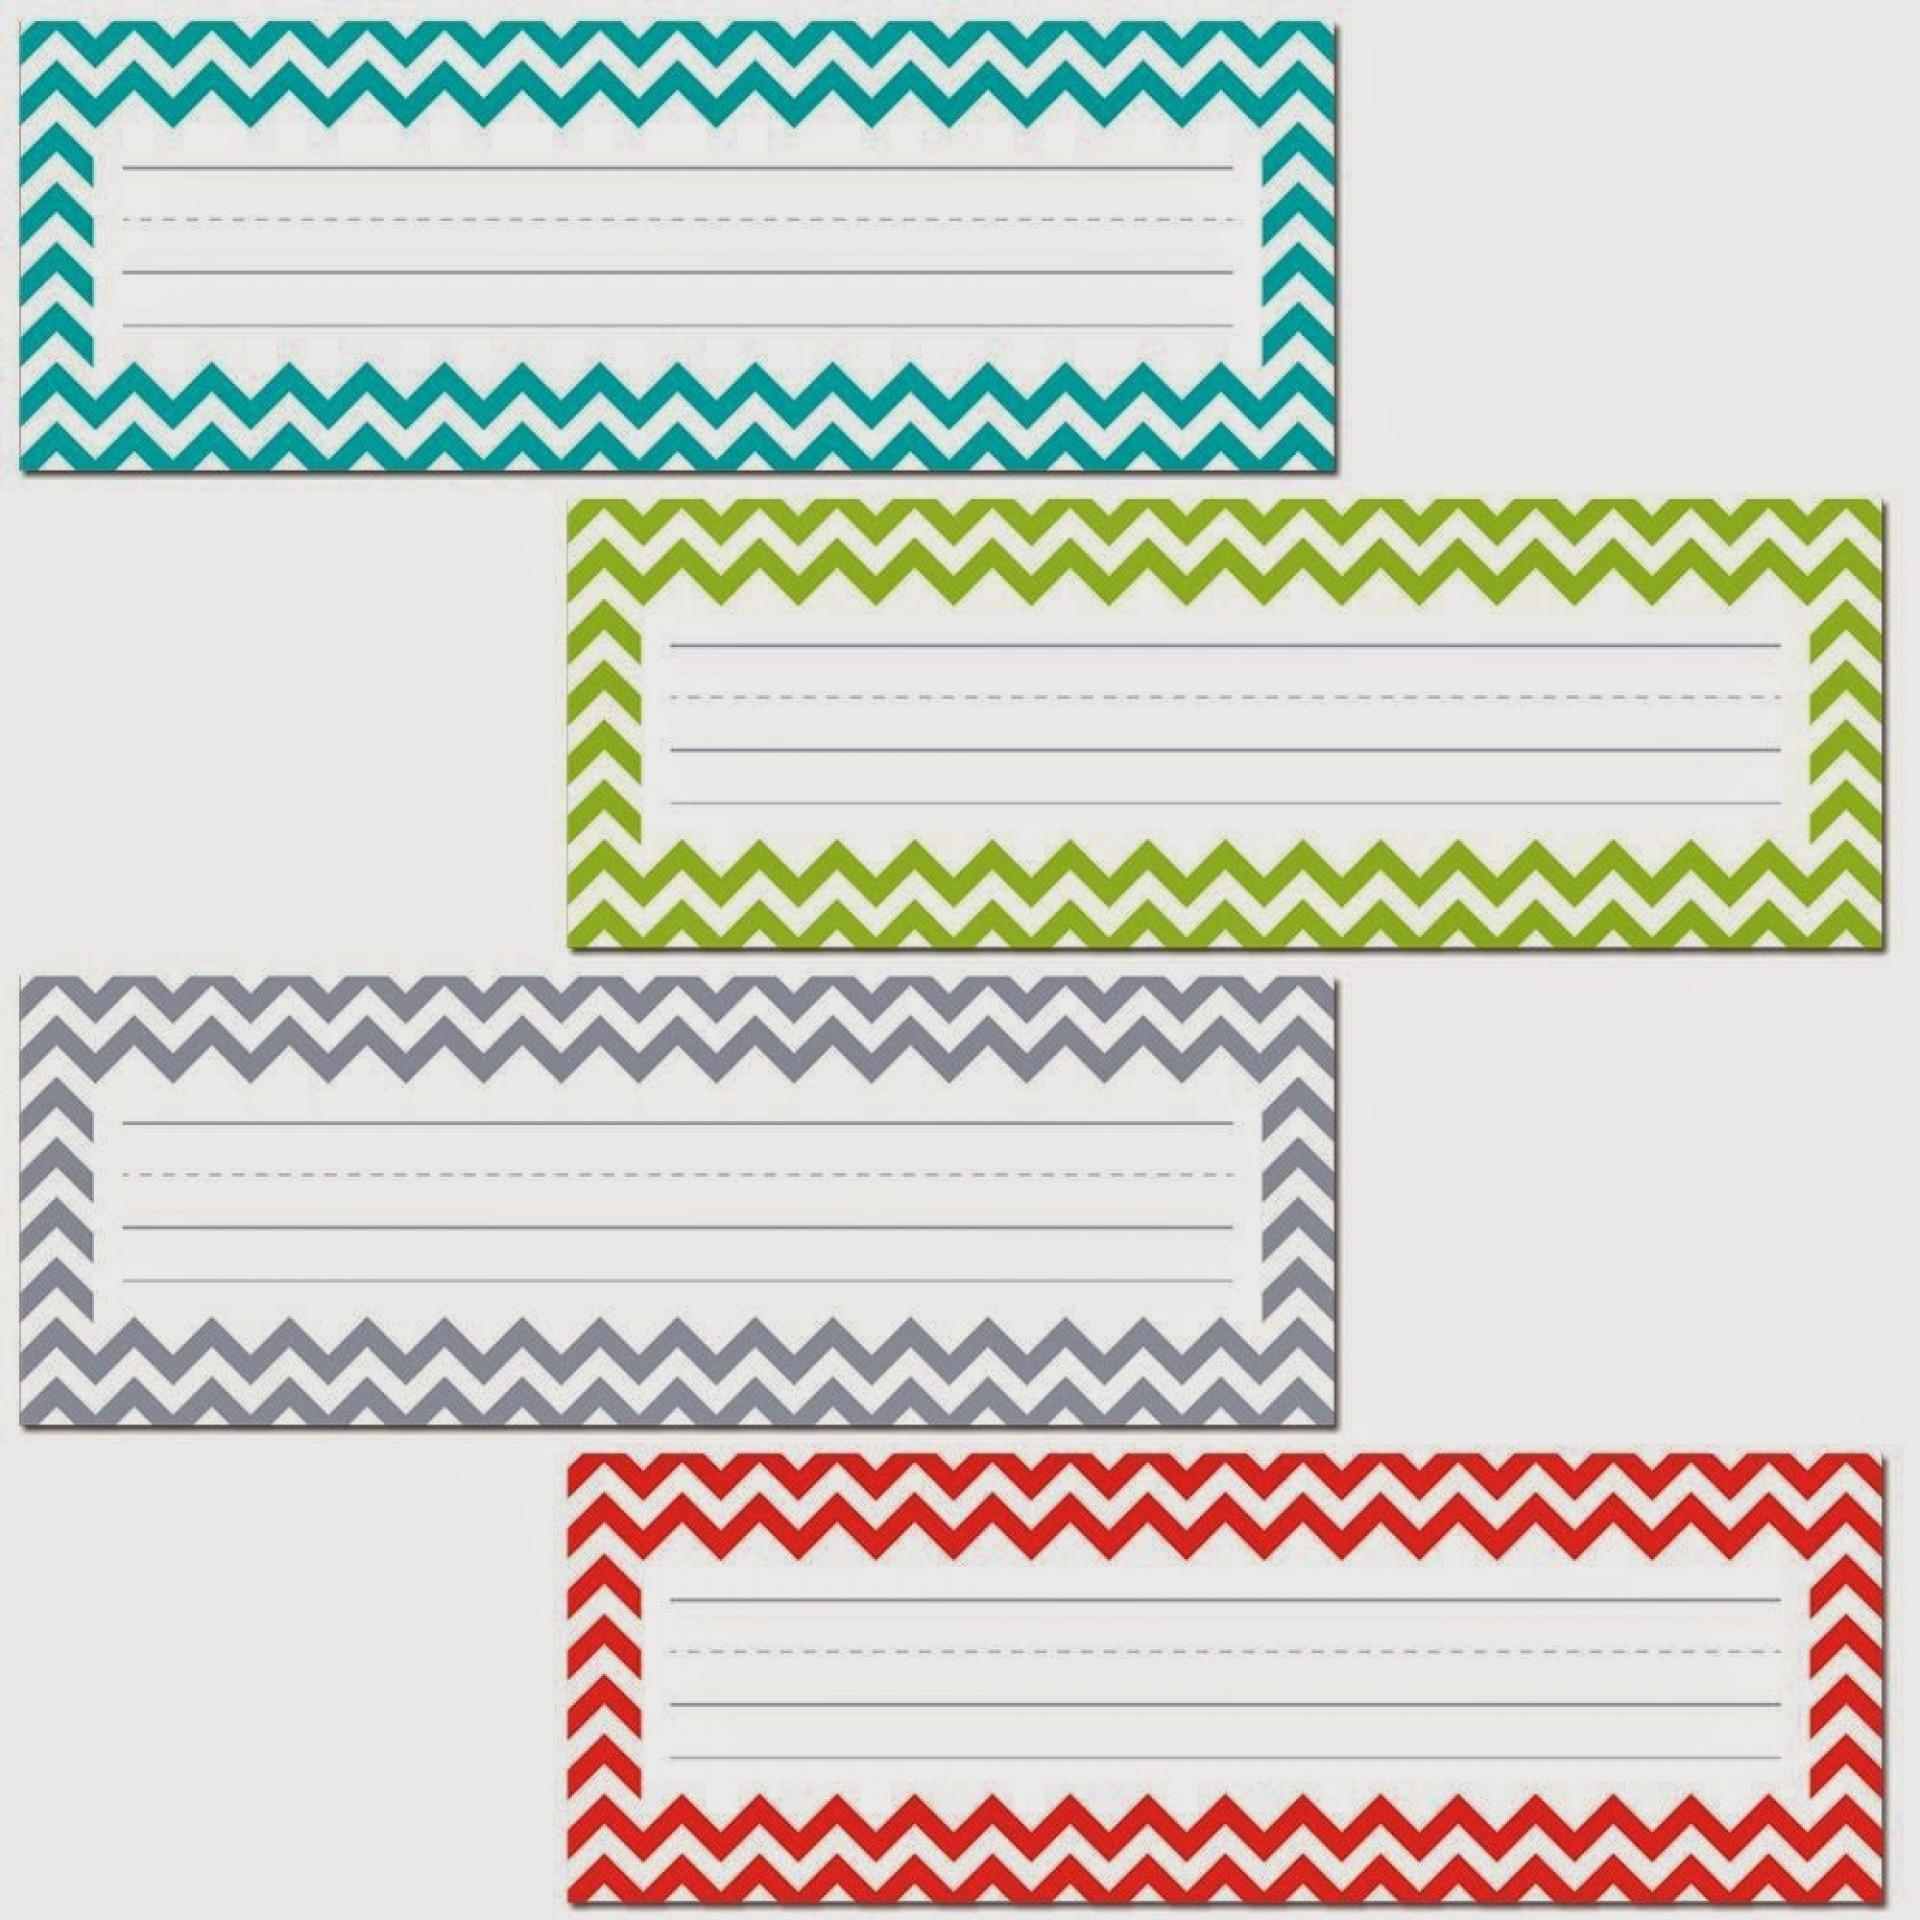 019 Free Printable Classroom Names 127791 Template Ideas ~ Ulyssesroom - Free Printable Name Tags For School Desks